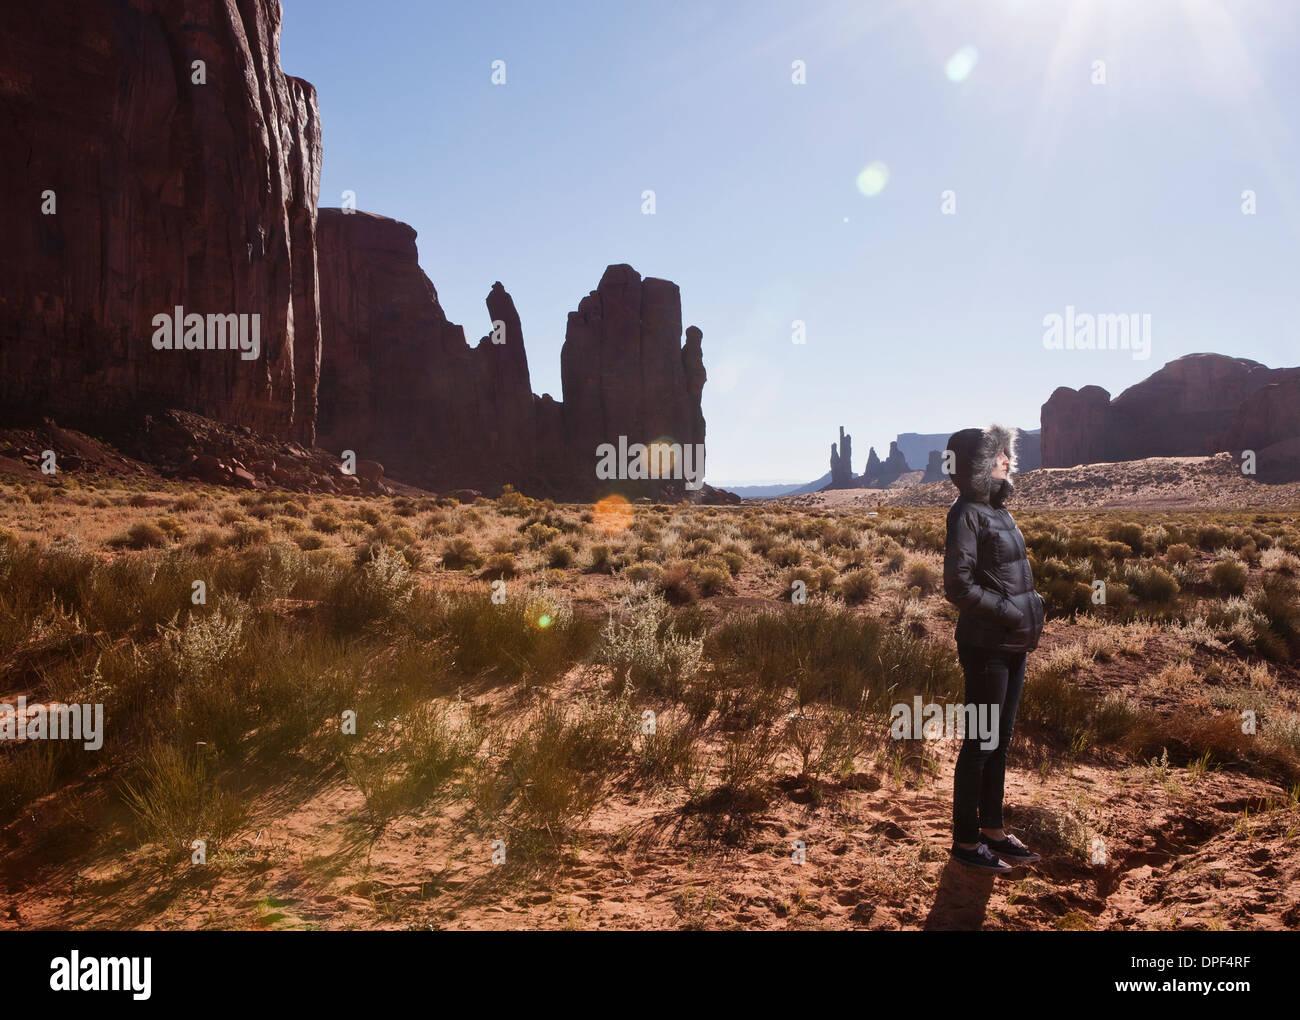 Female tourist alone in Monument Valley, Navajo Tribal Park, Arizona, USA - Stock Image